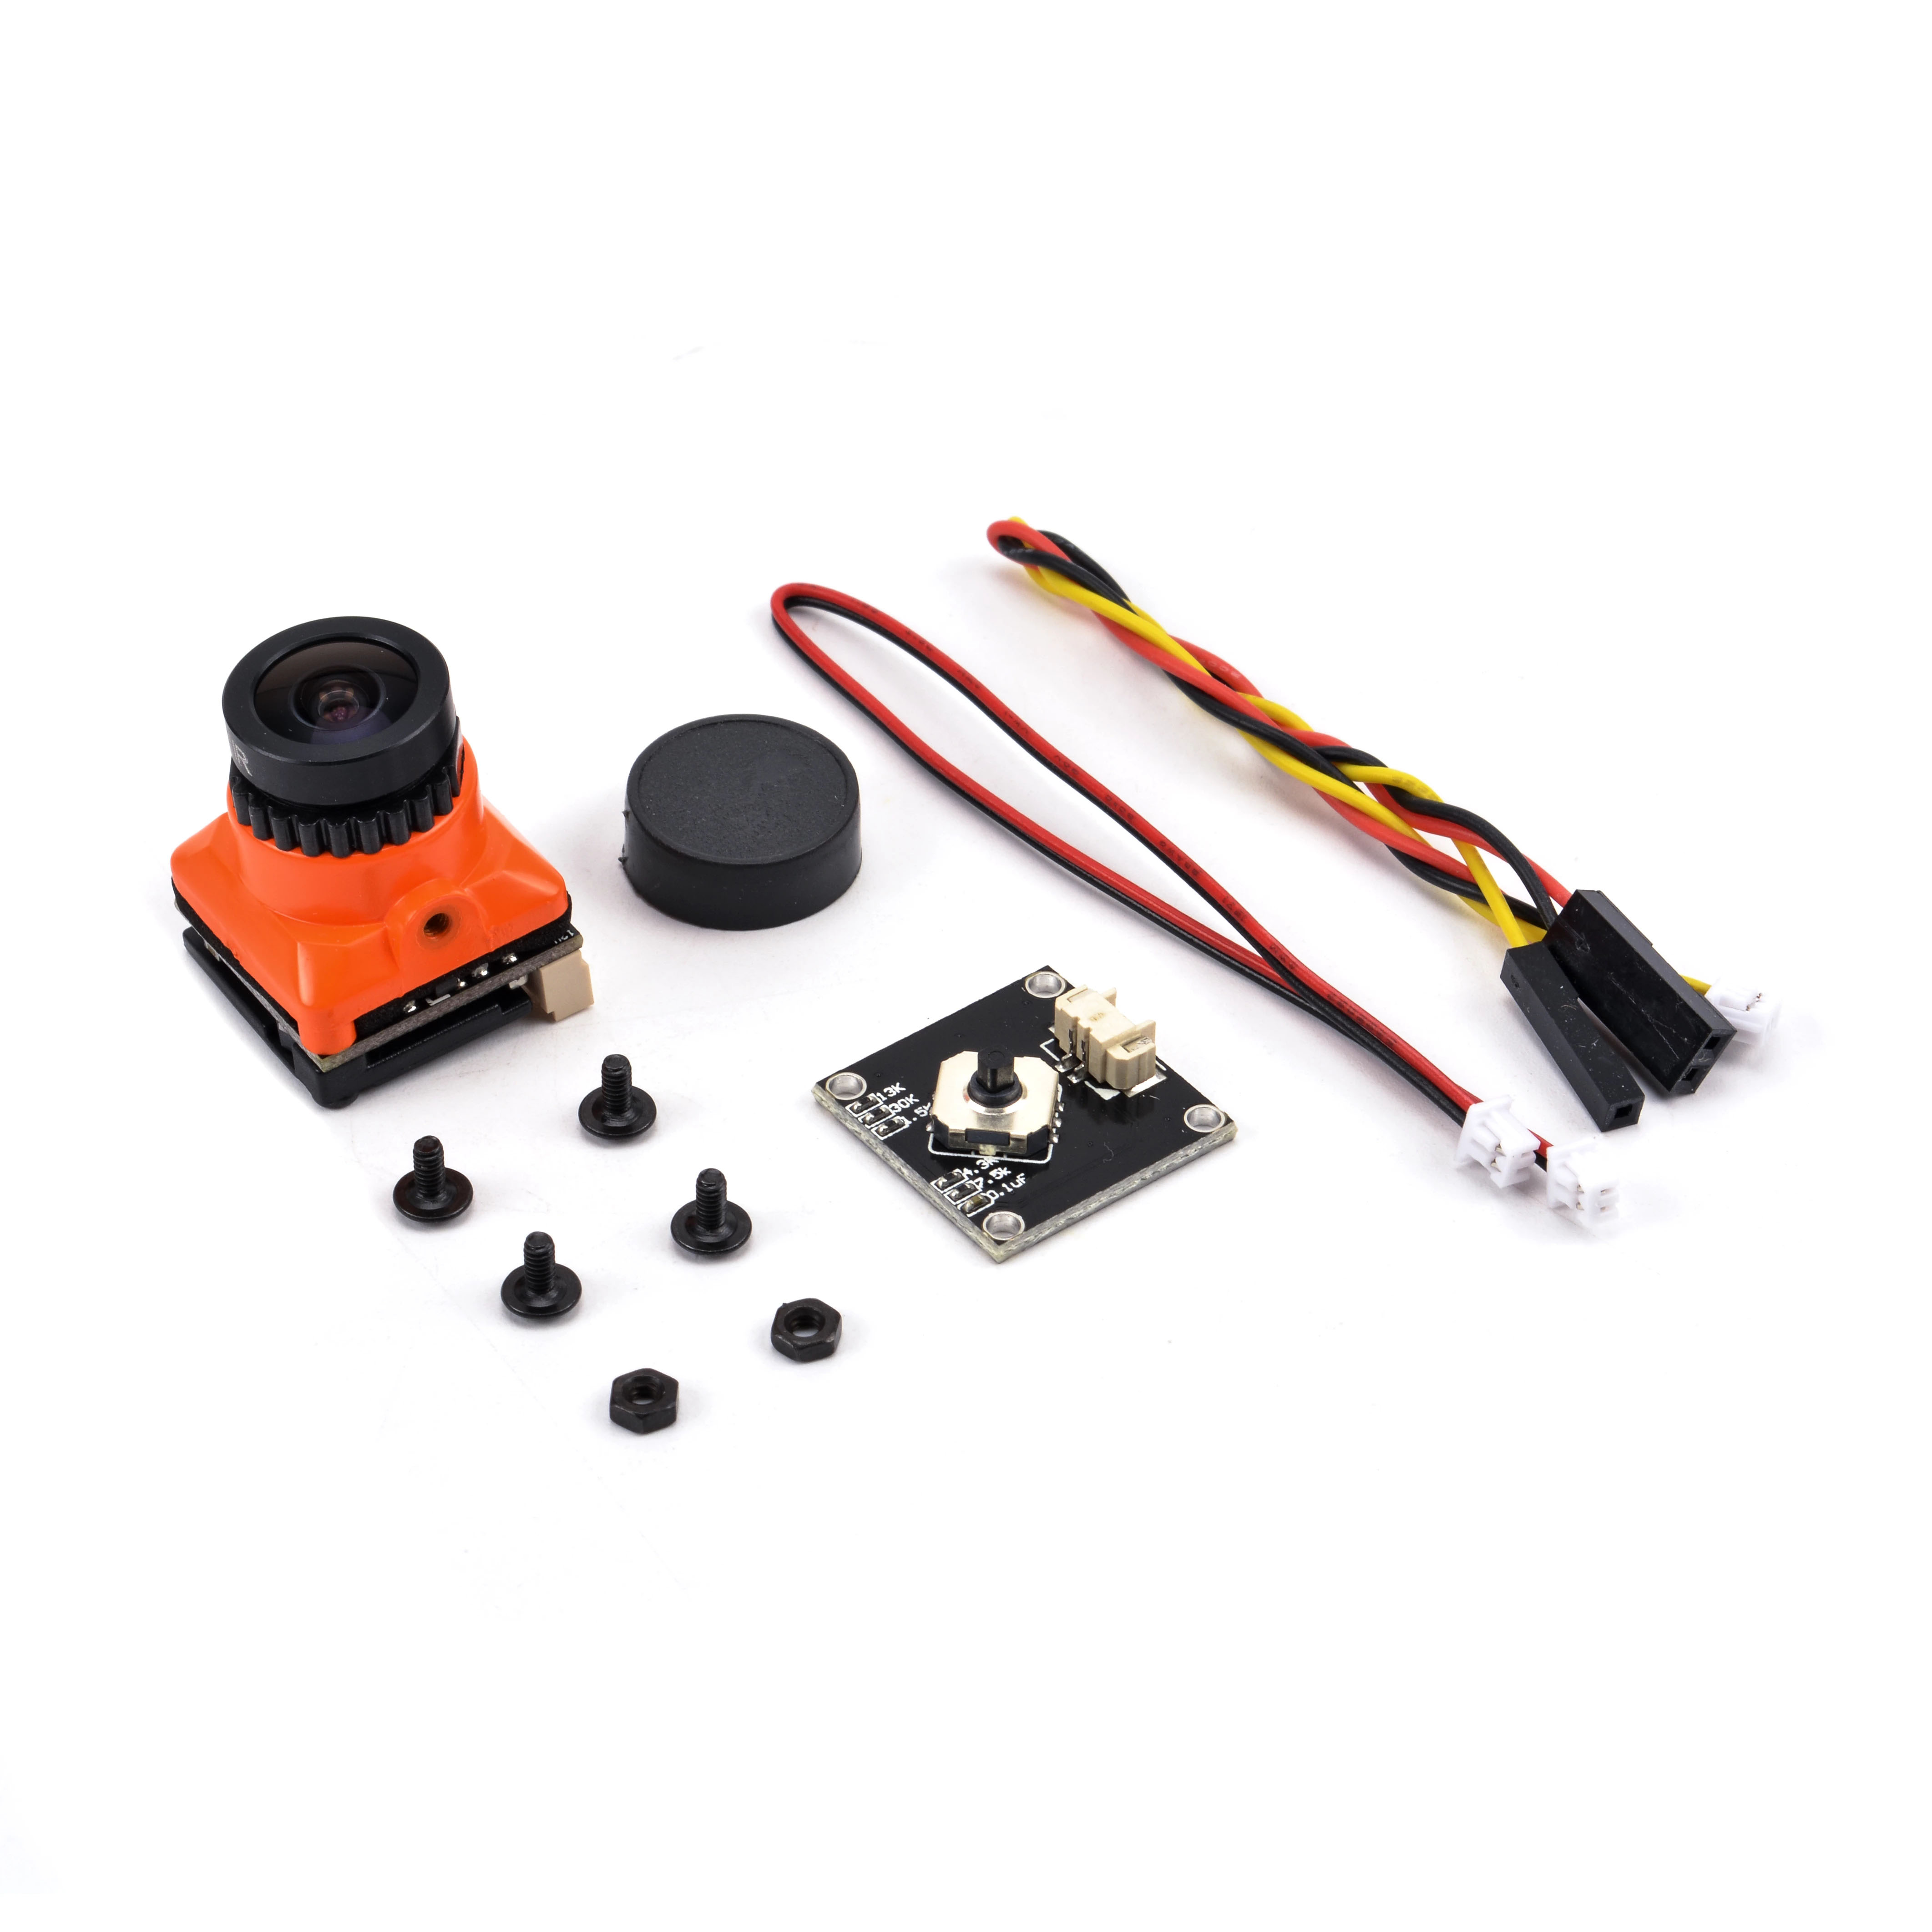 كاميرا صغيرة FPV 1/3 CMOS 1500TVL B19 ، lente de 2,1 مللي متر PAL / NTSC مع OSD دي فاونسيا إنتر قابل للتعديل 5V-30 الفقرة درون دي كاريرا